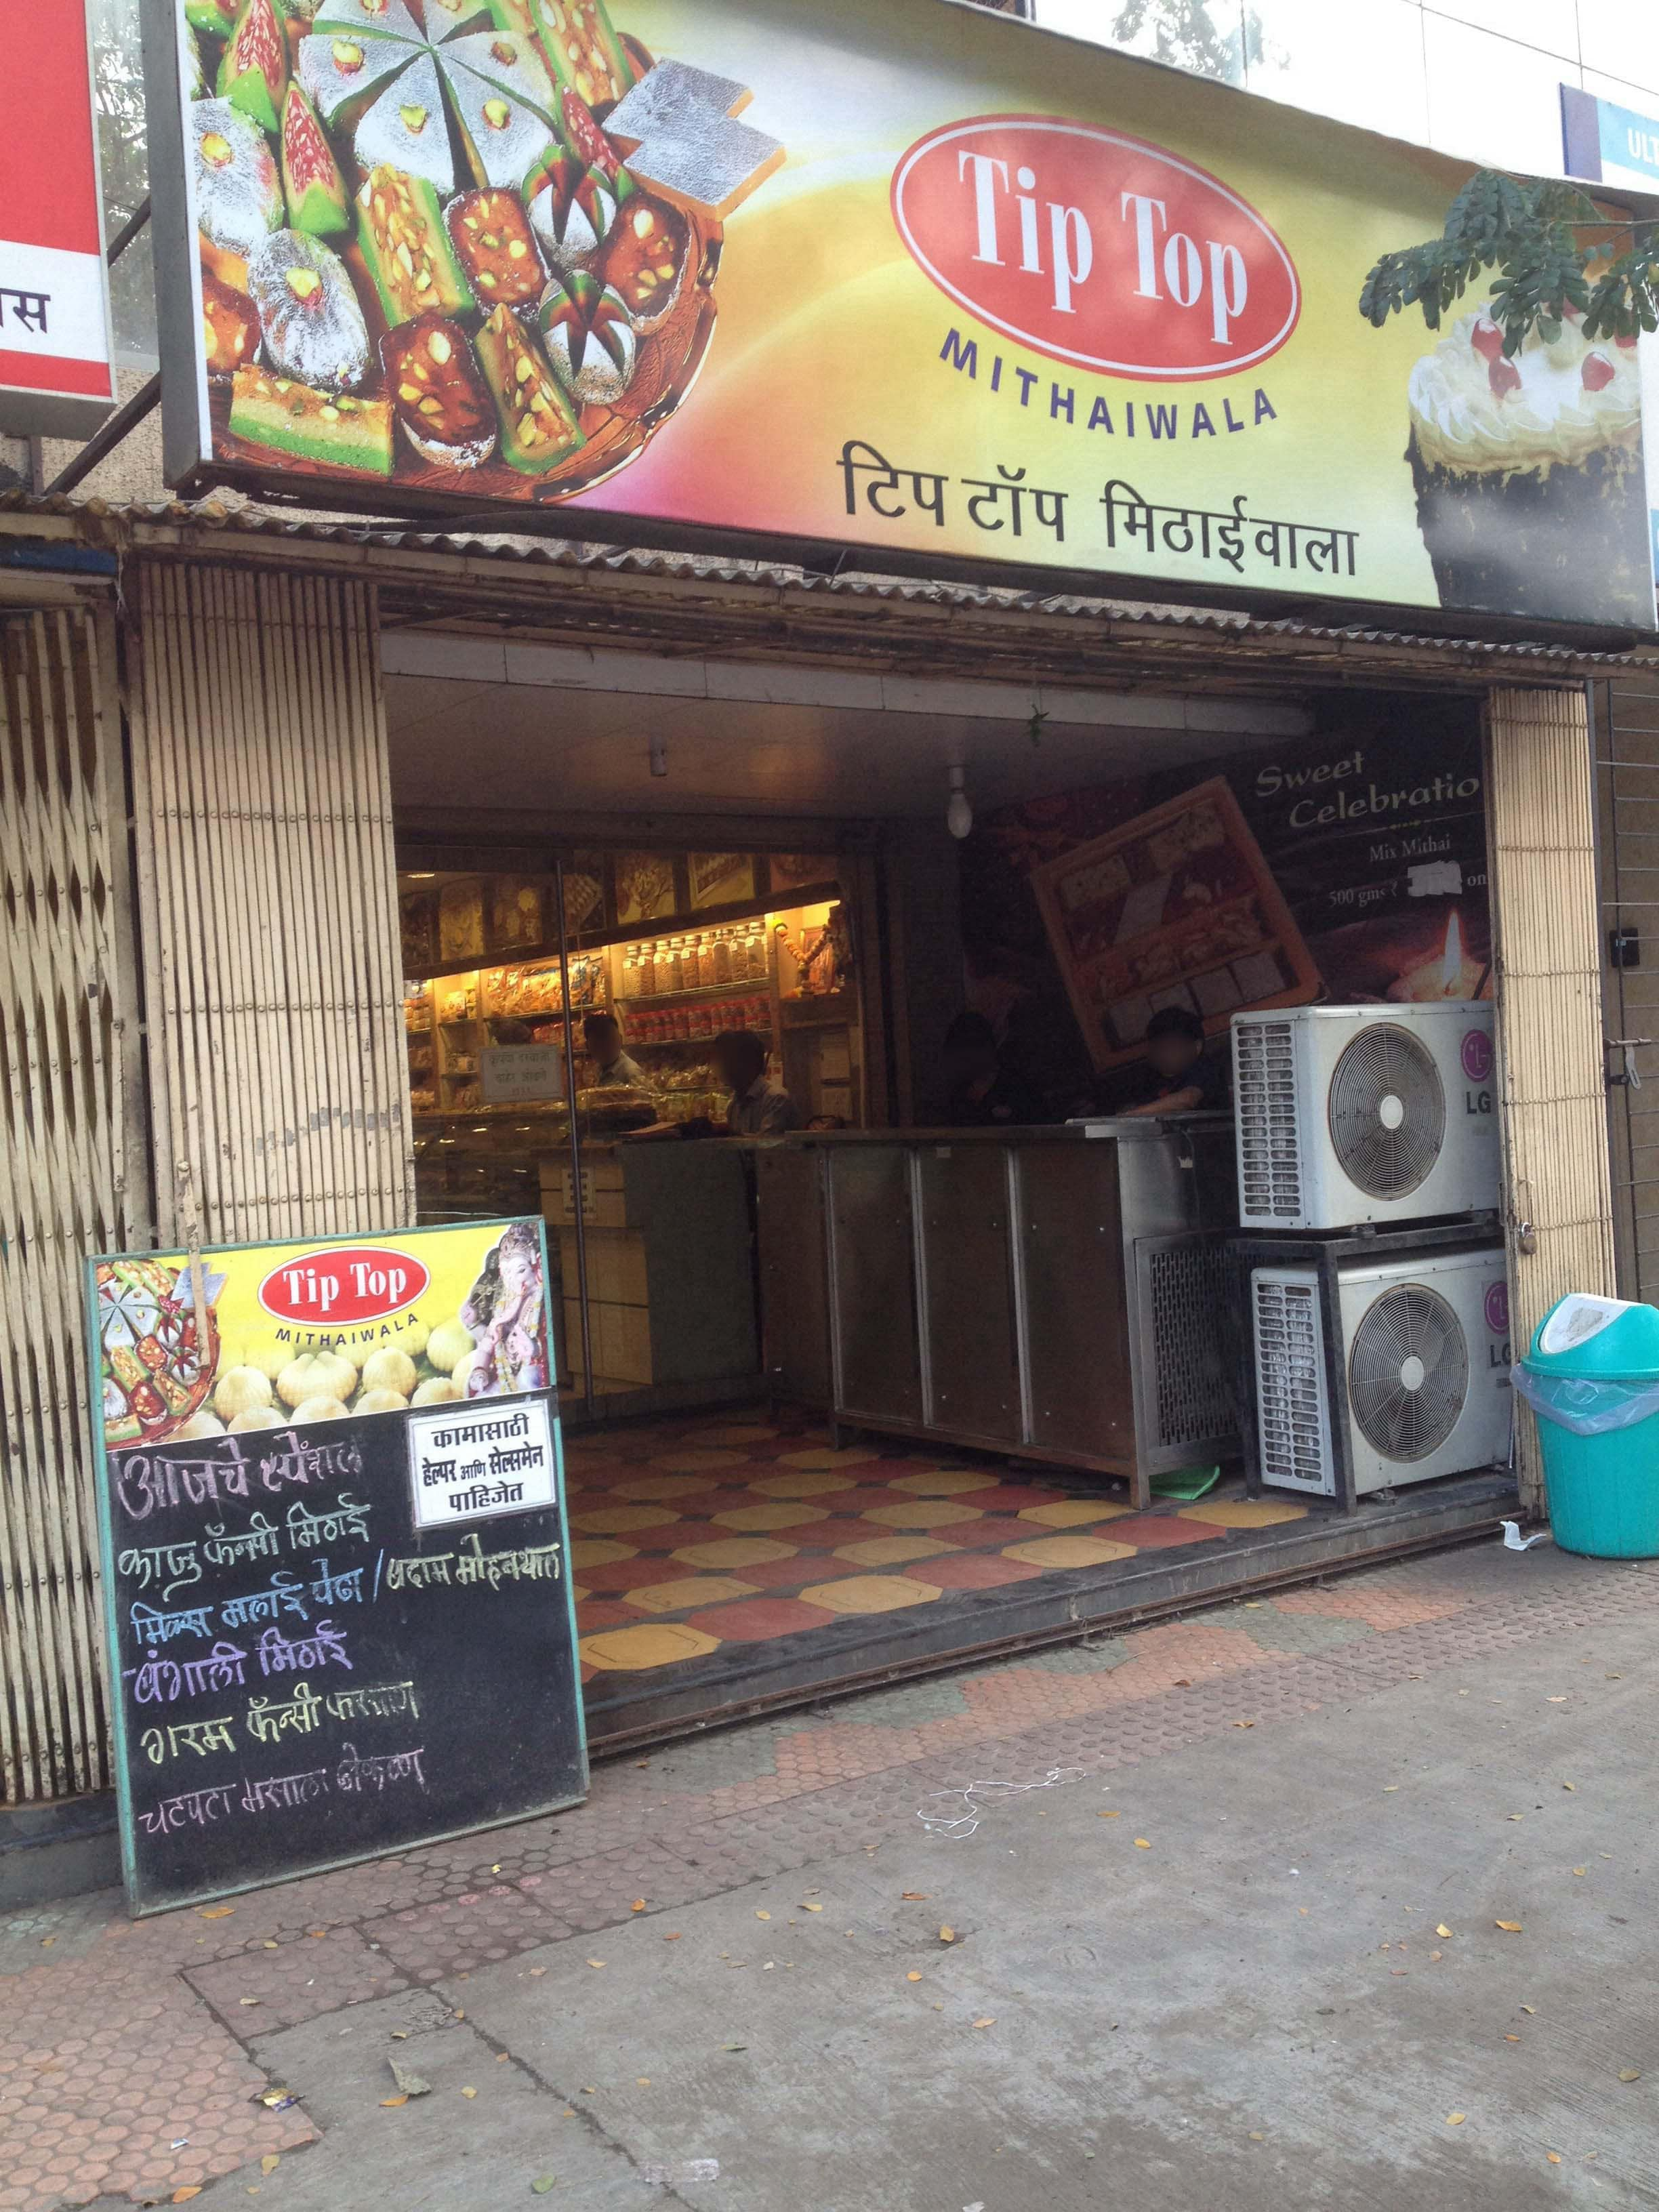 Tip Top Mithaiwala - Kalwa - Thane Image